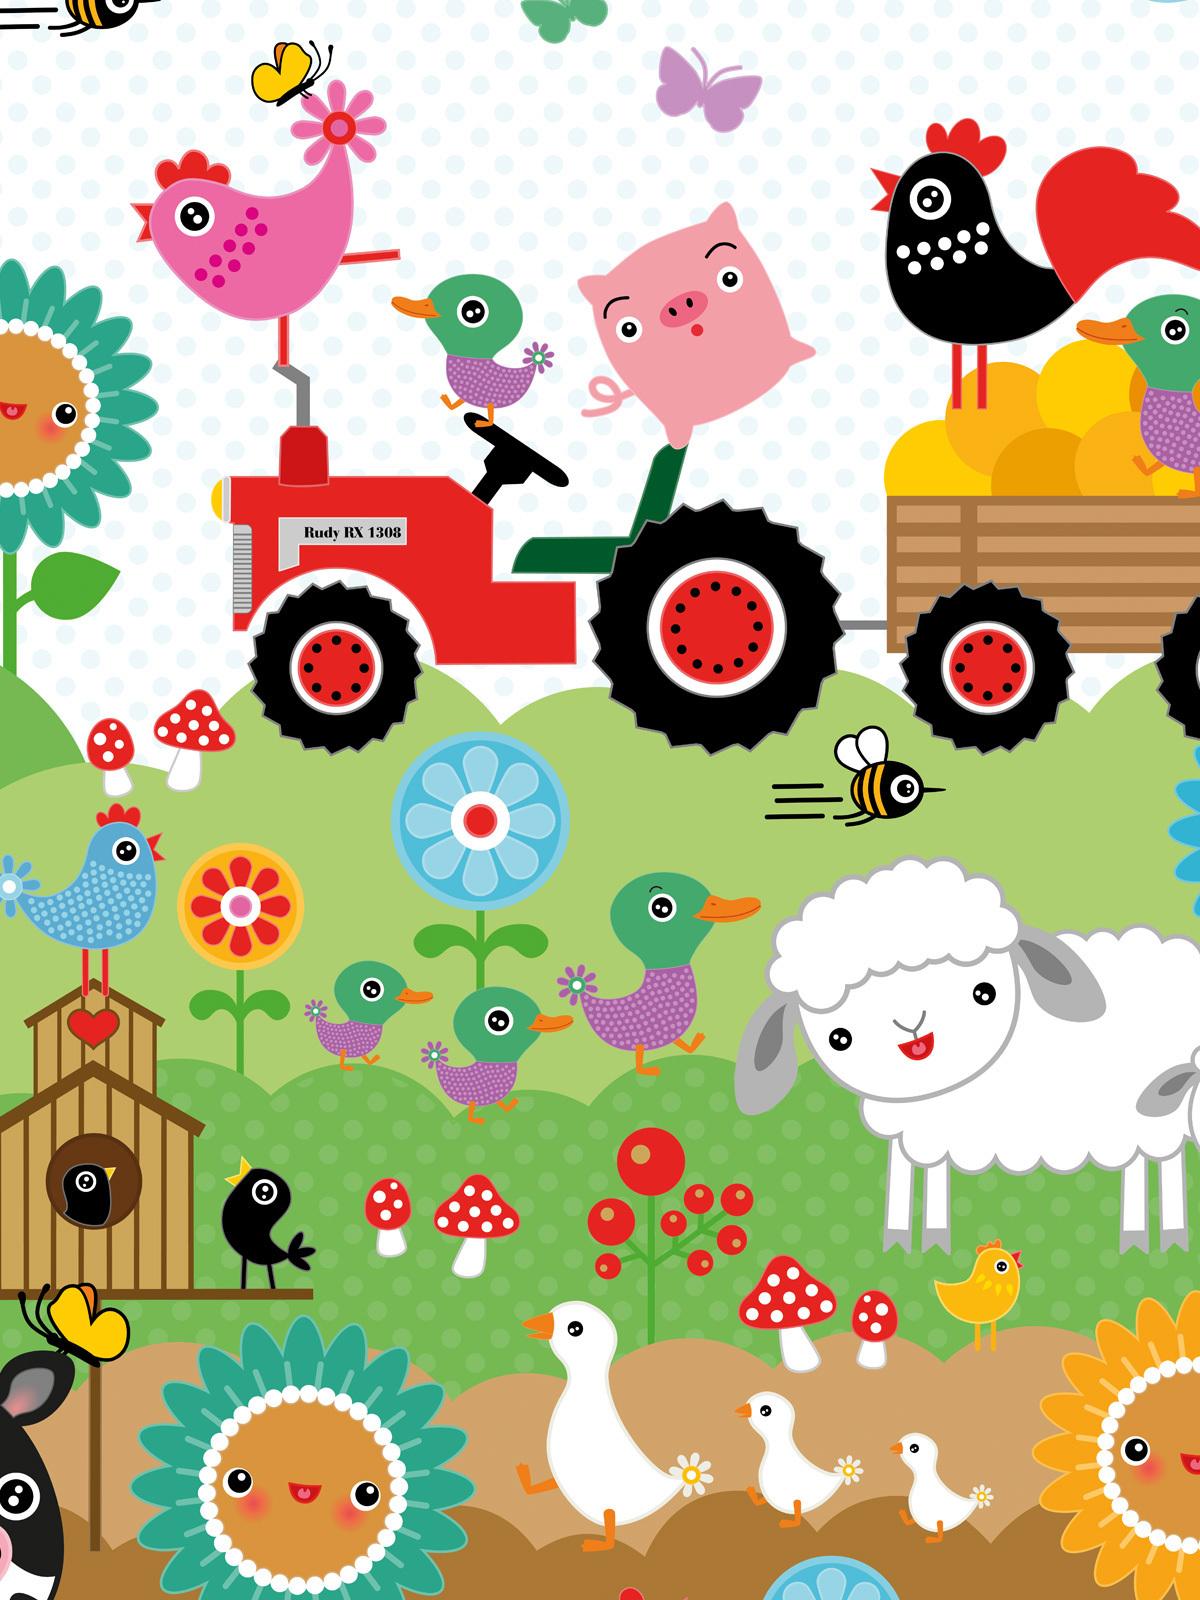 Full Size of Wandbild Kinderzimmer Tapete Huhn Emma Auf Dem Bauernhof Miyo Mori Regal Weiß Regale Wandbilder Wohnzimmer Schlafzimmer Sofa Kinderzimmer Wandbild Kinderzimmer